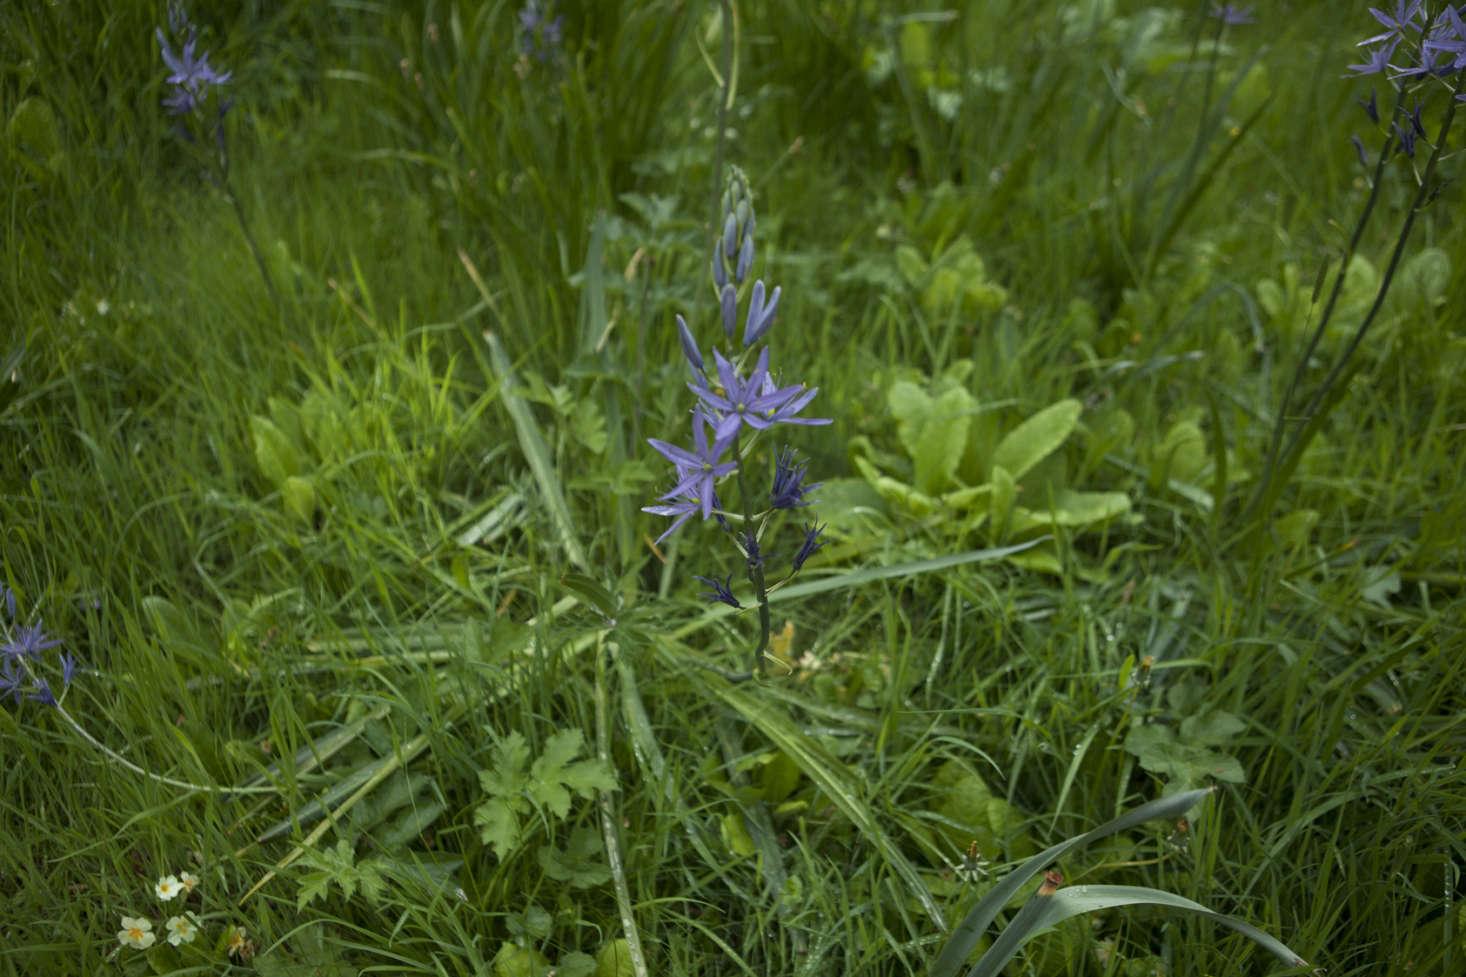 Purple camassia,growing in grass.